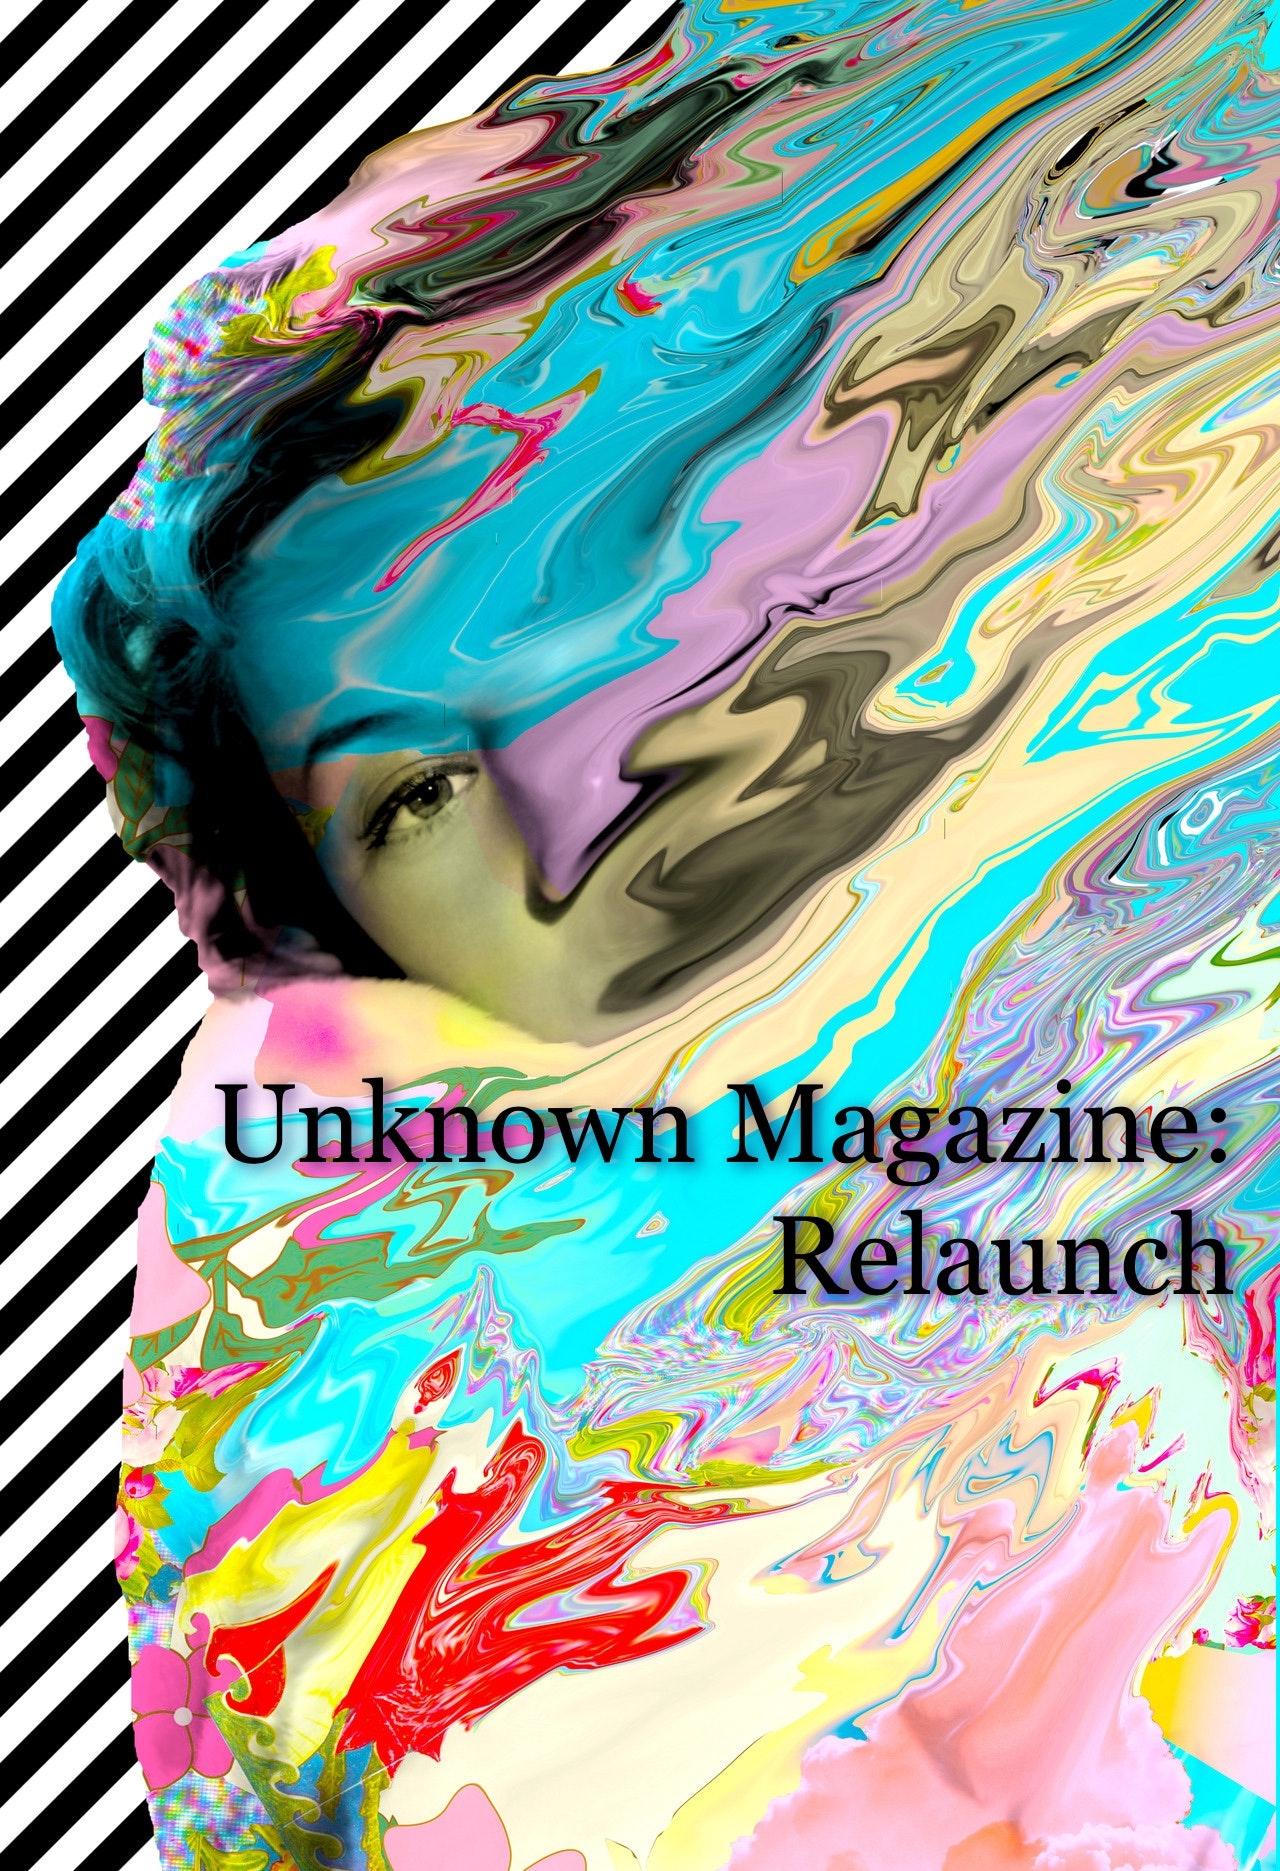 Unknown Magazine: Relaunch